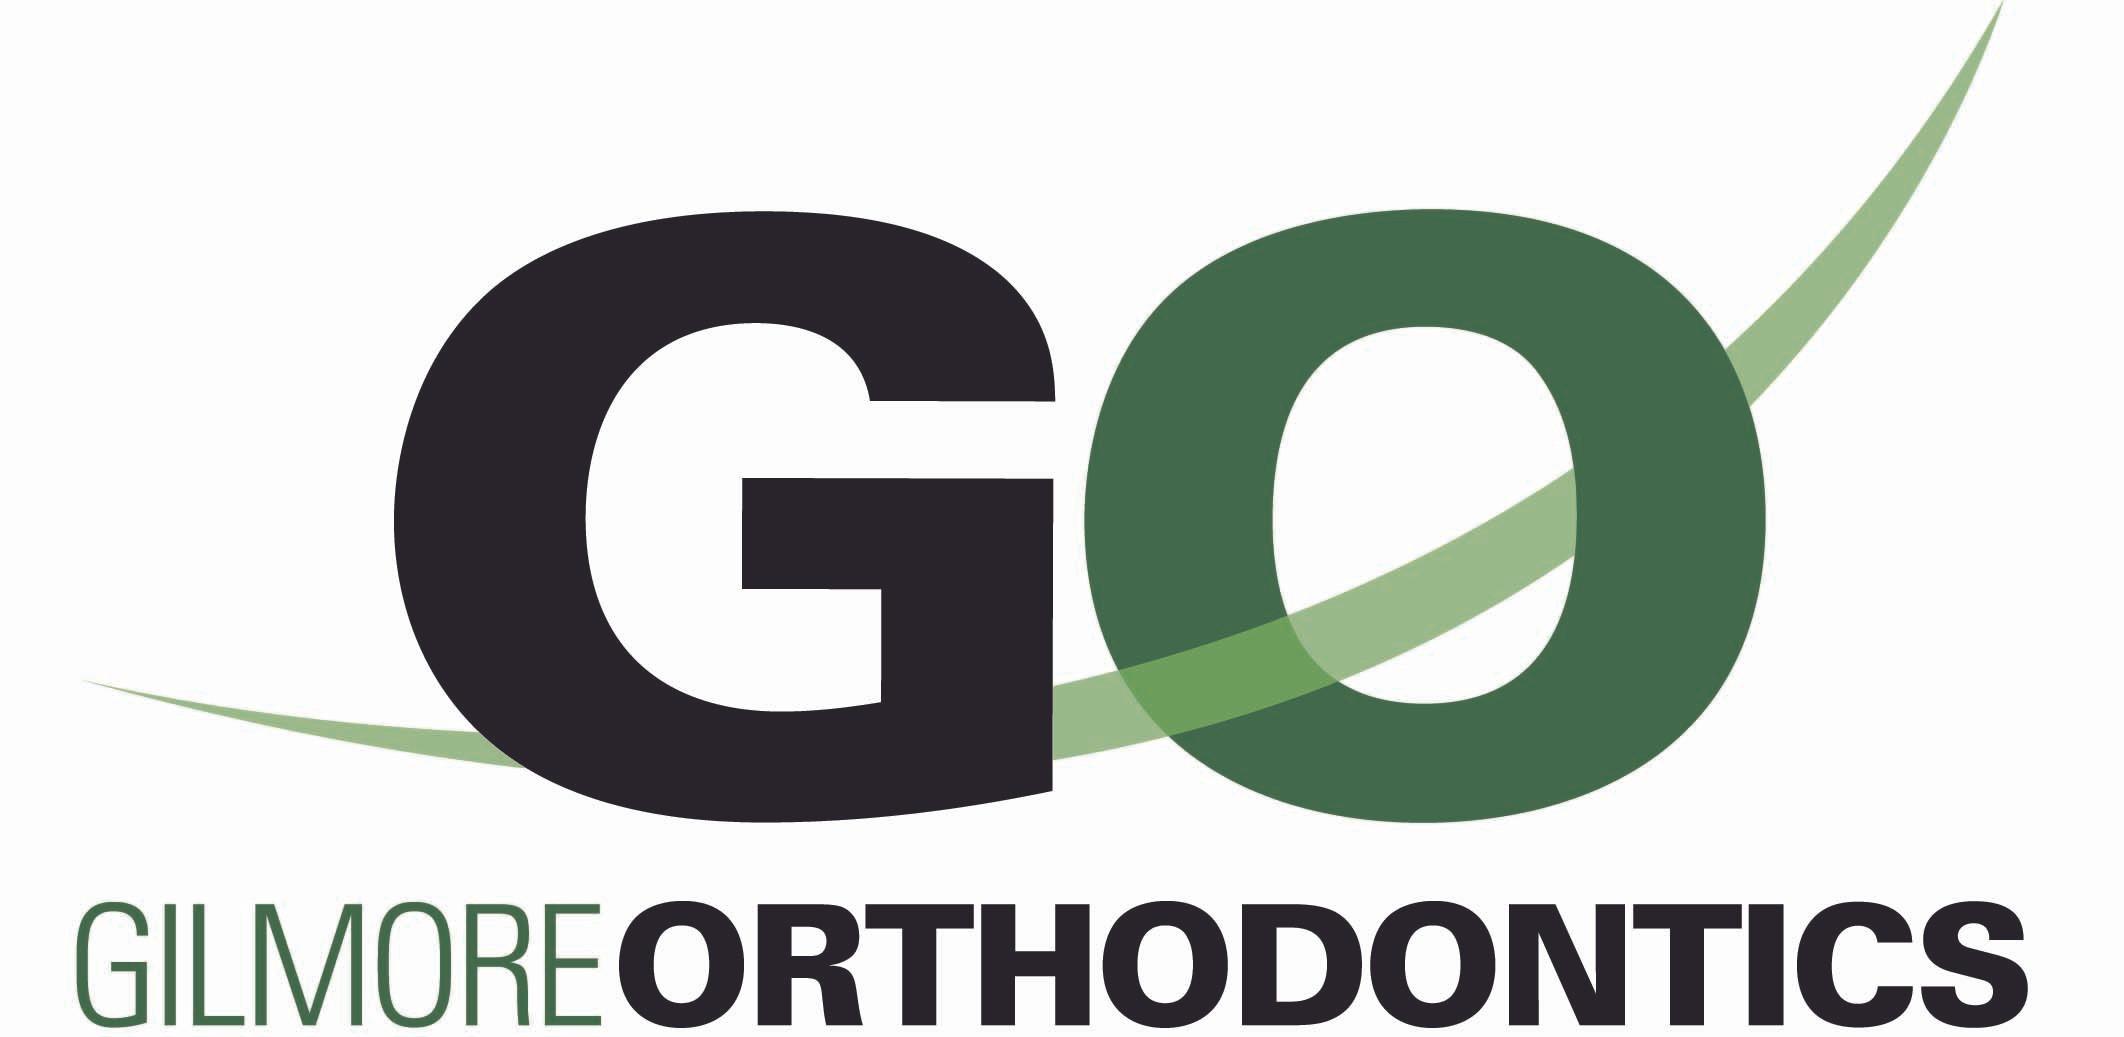 GilmoreOrthodontics.jpg